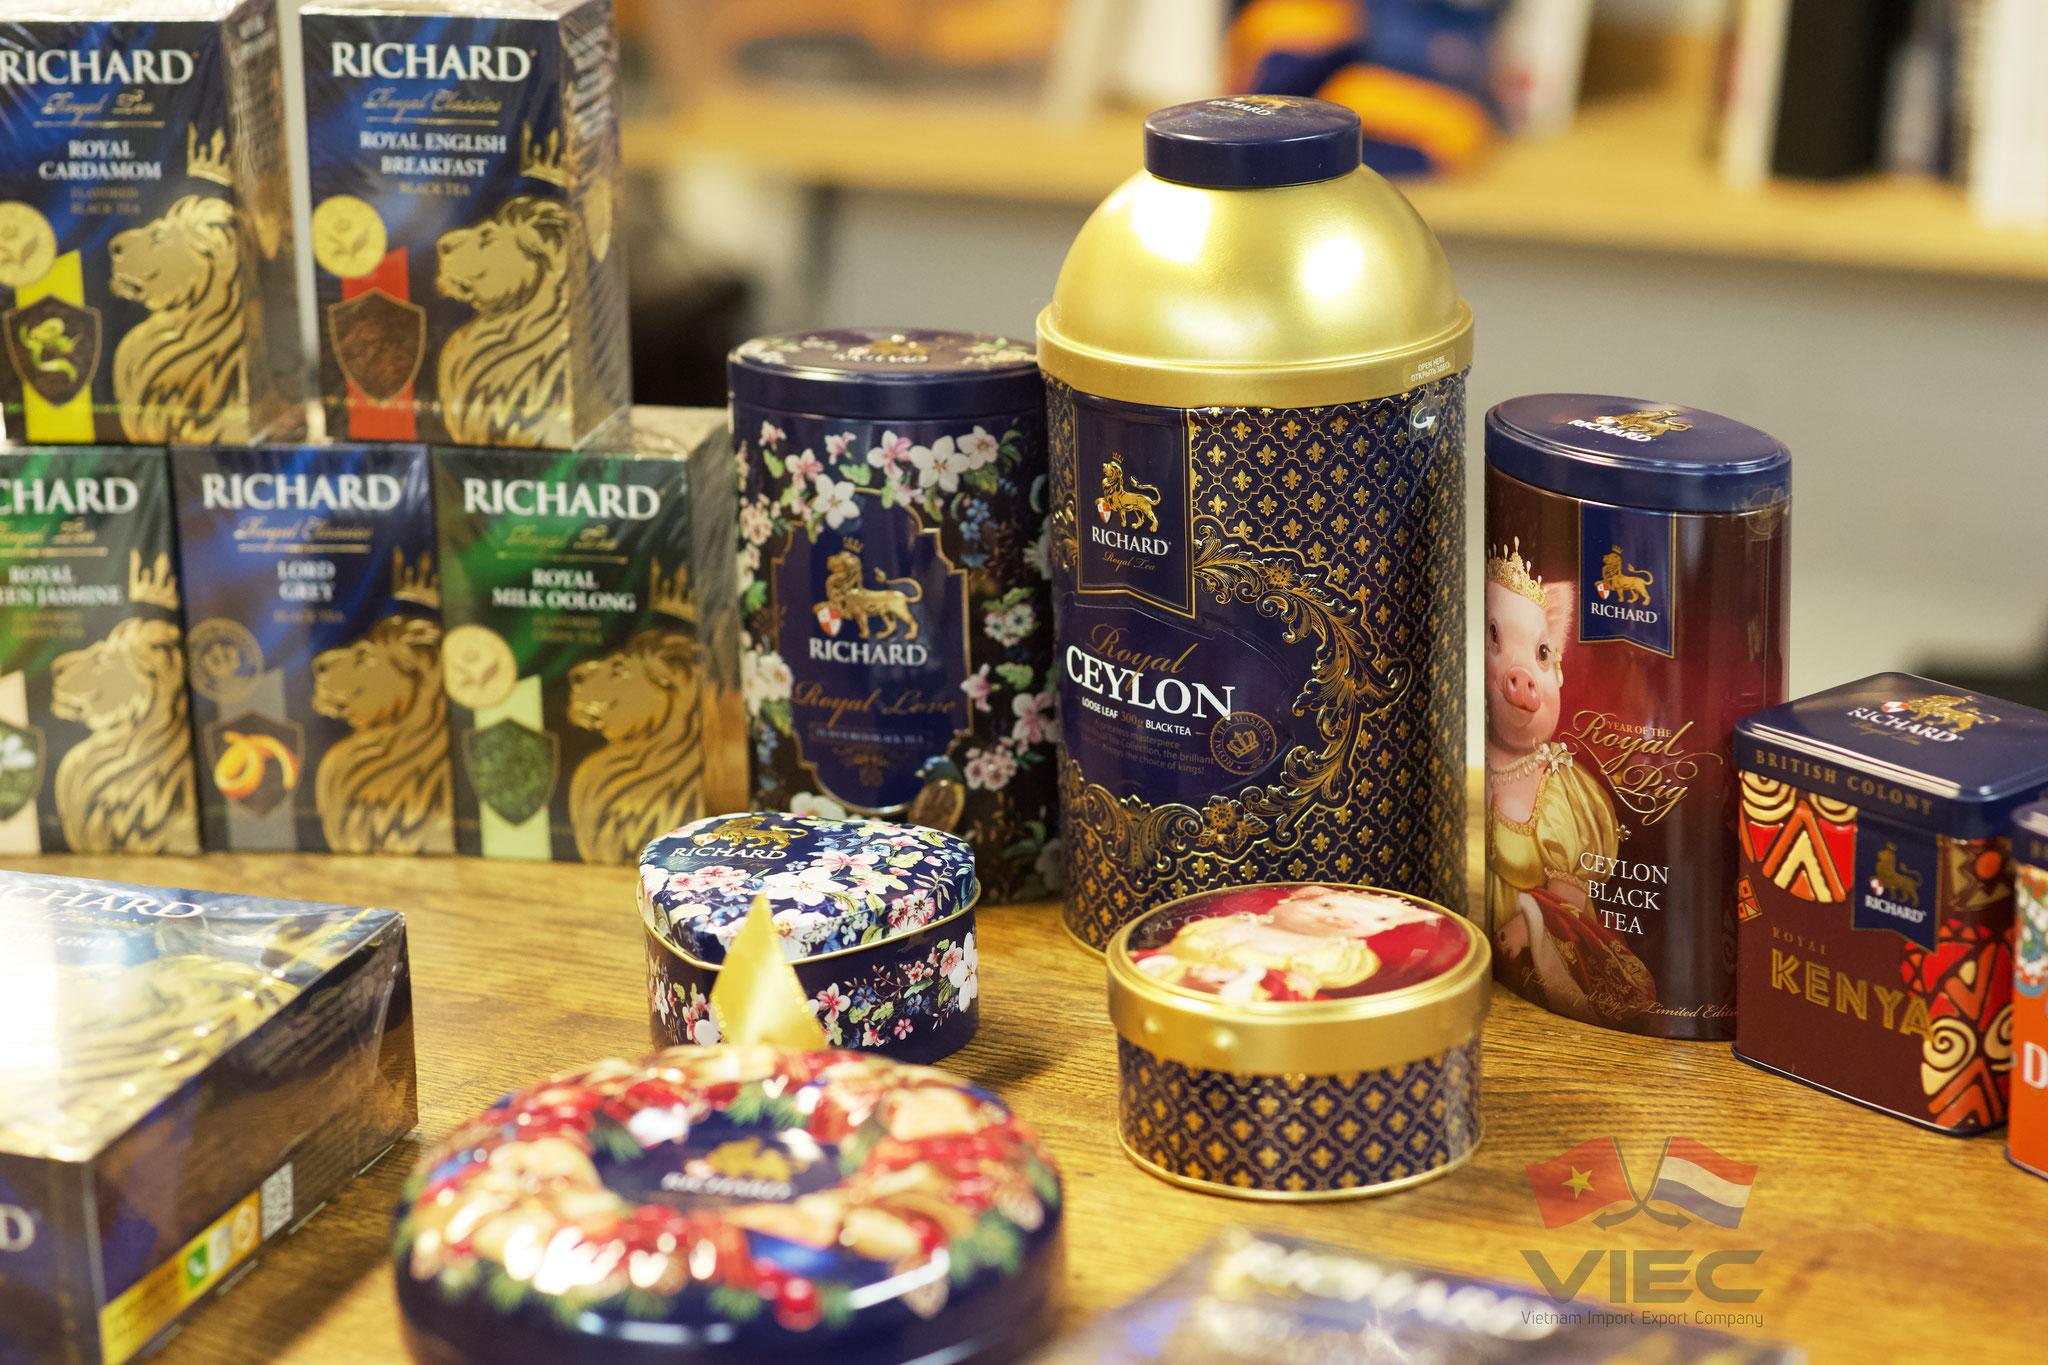 Richard Royal Tea from UK